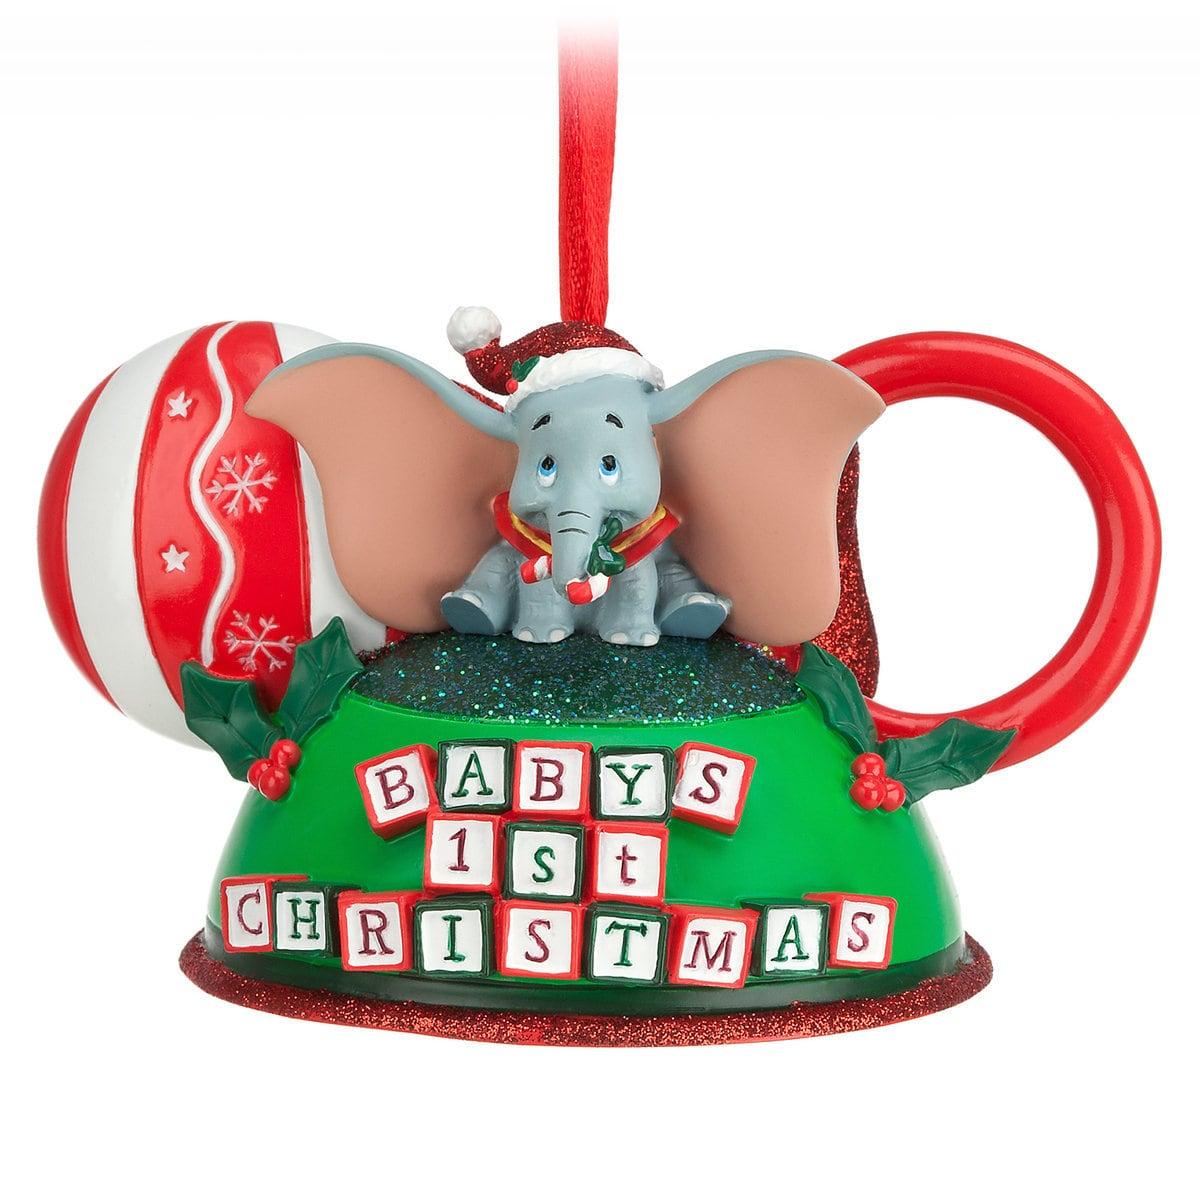 dumbo babys first christmas ornament disney